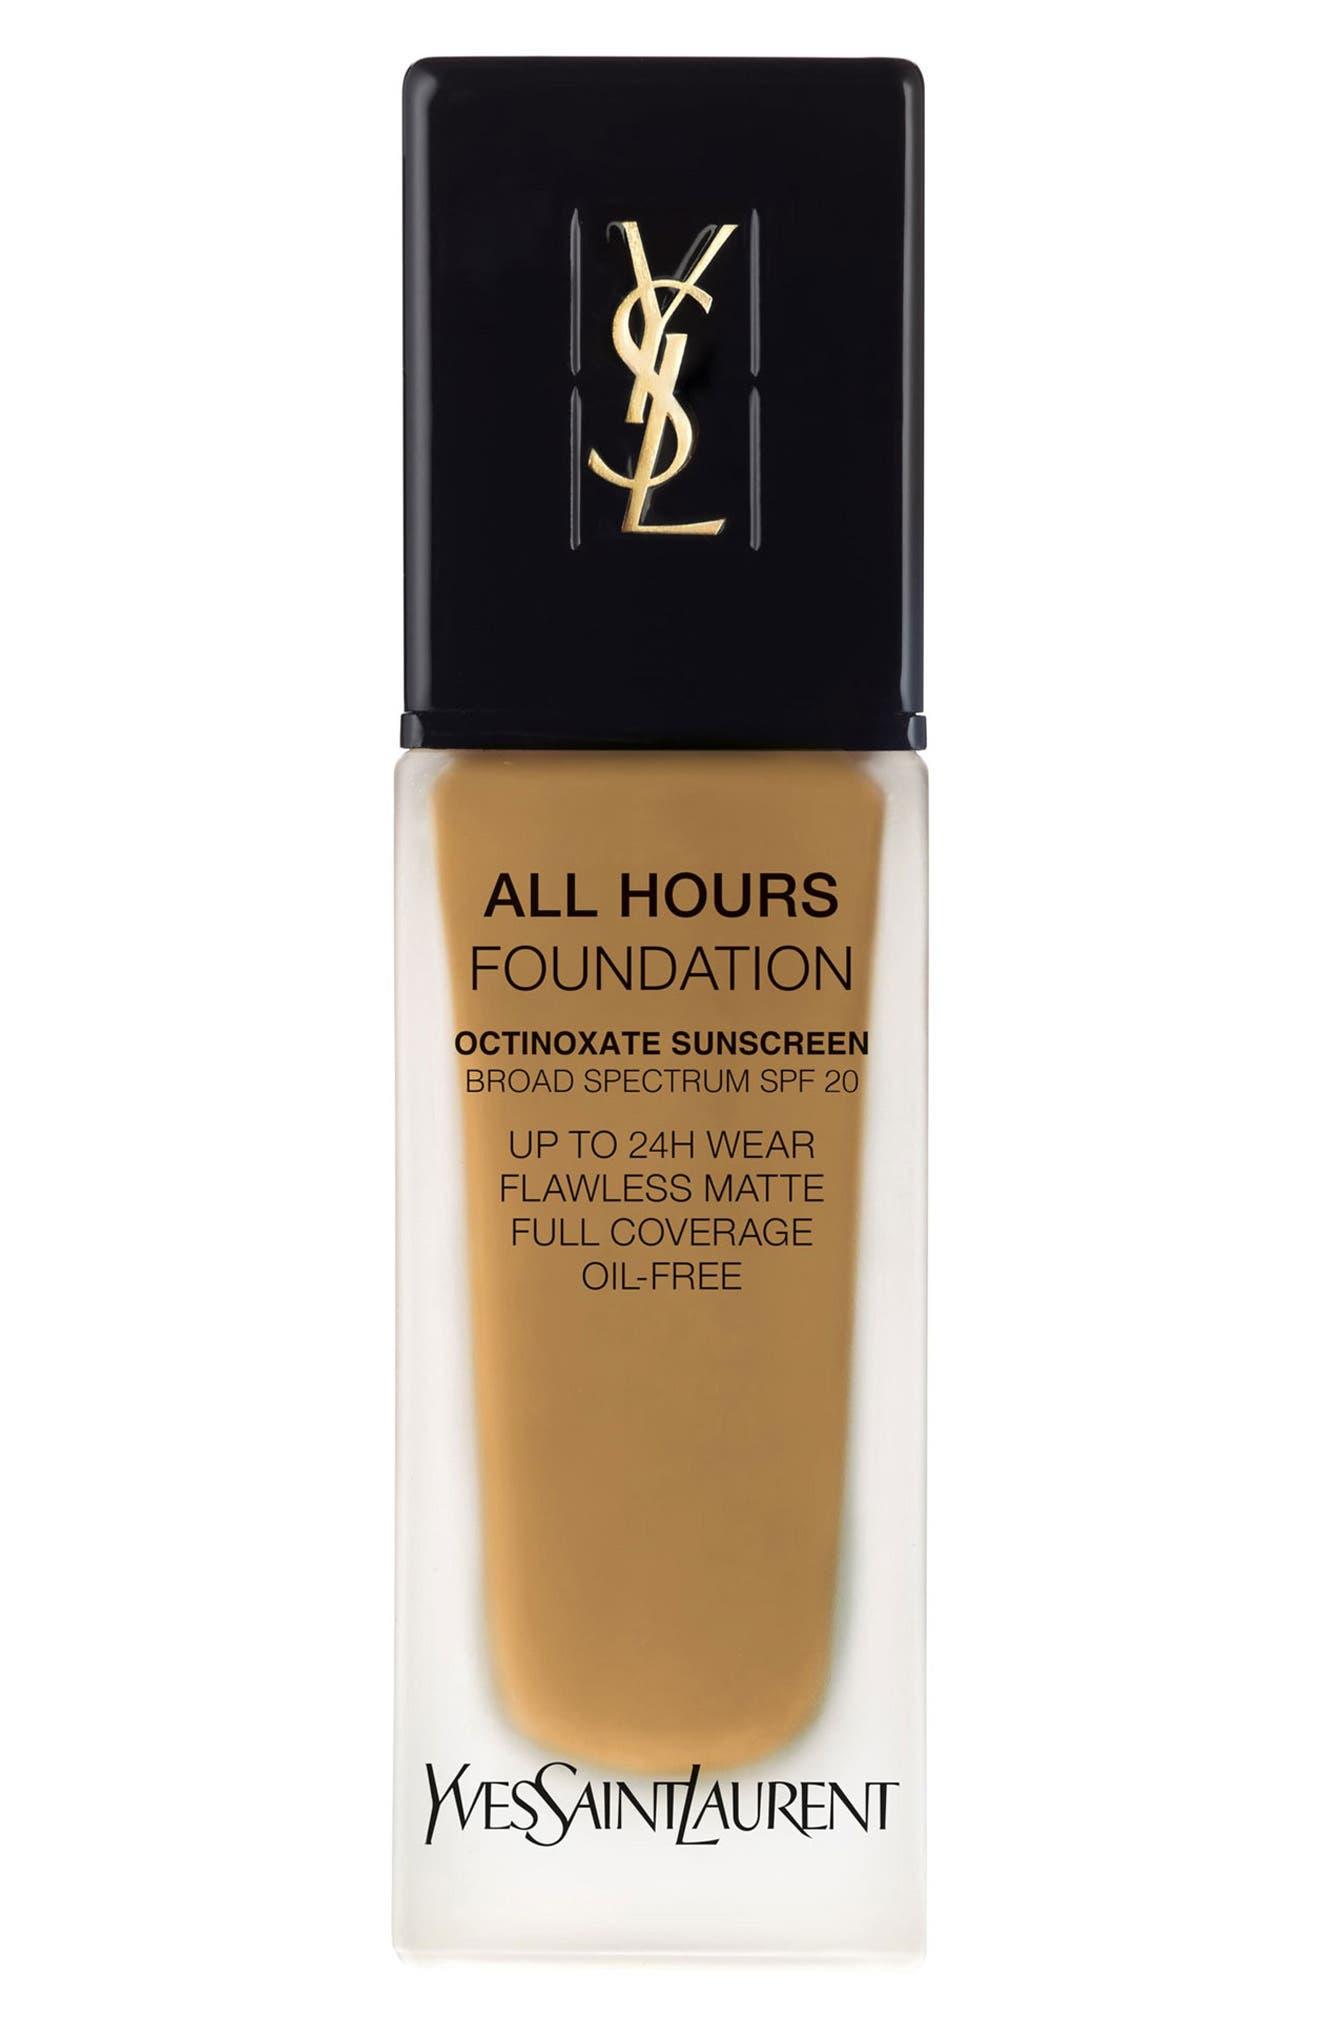 Yves Saint Laurent All Hours Full Coverage Matte Foundation Spf 20 - Bd70 Warm Mocha